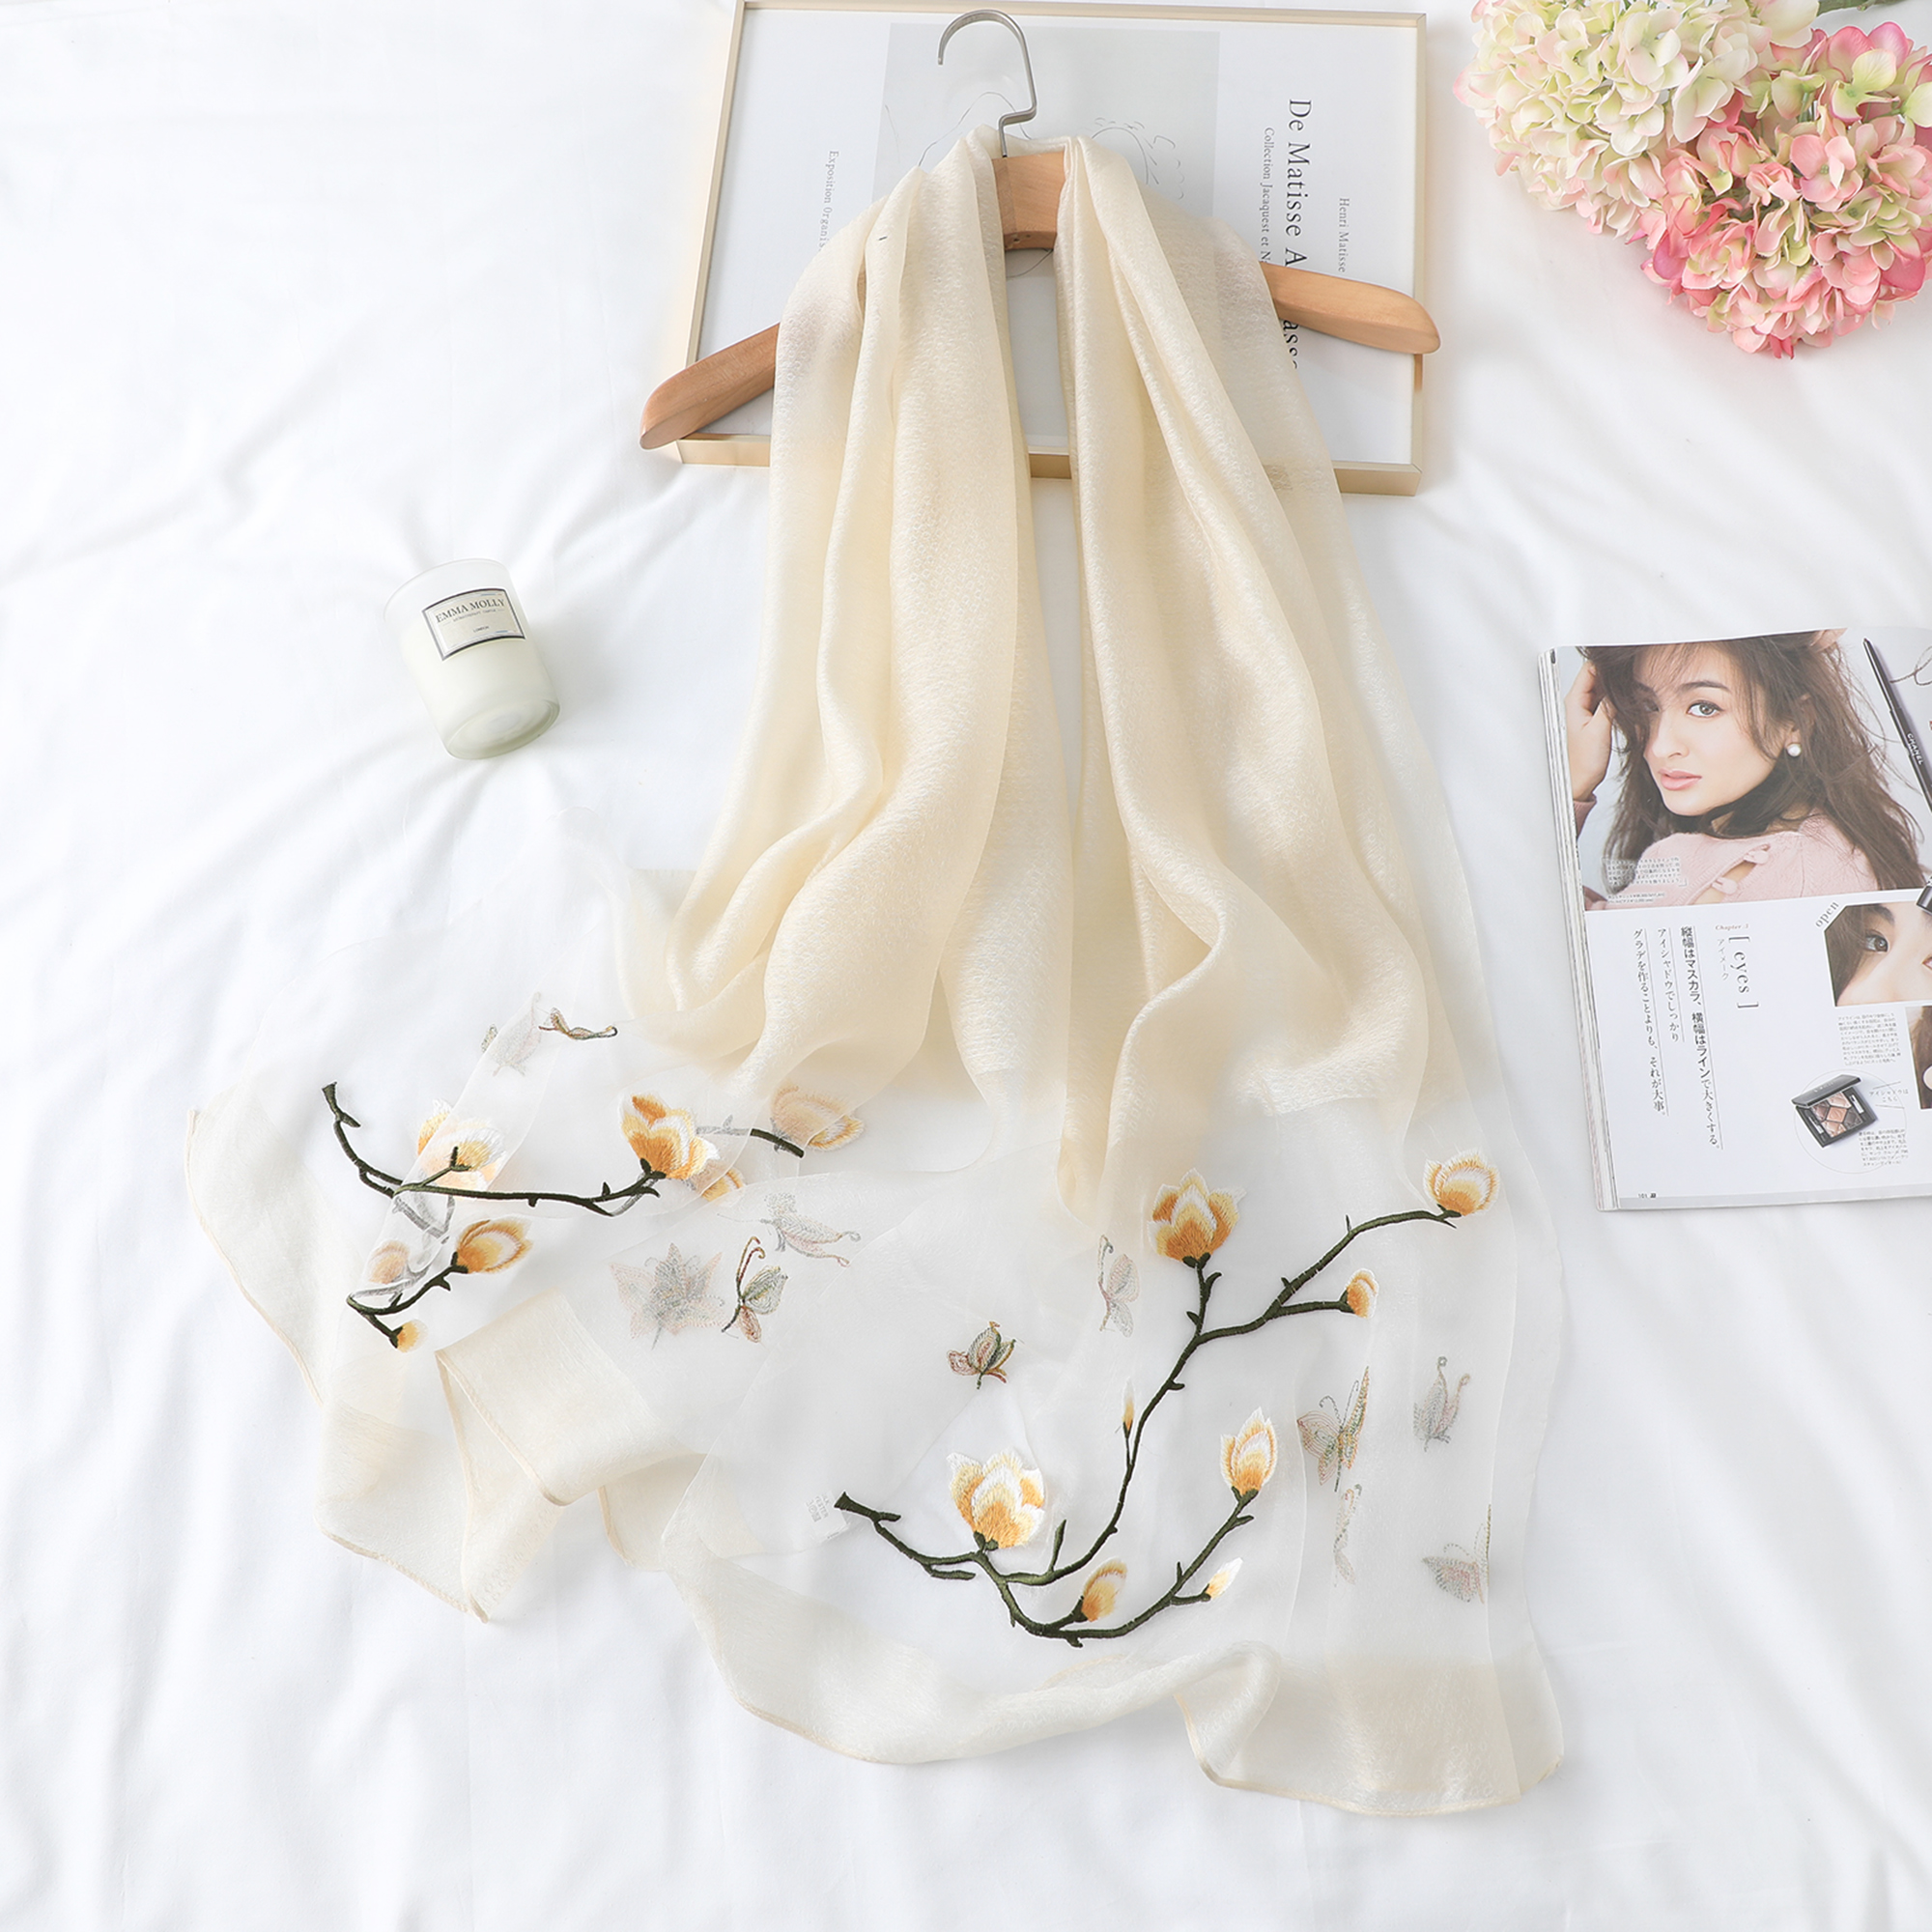 Women Silk Scarf Soft Solid Female Embroidery Cape High Quality Shawl Ladies Beach Wrap Femme Pashmina Fashion Scarf 2019